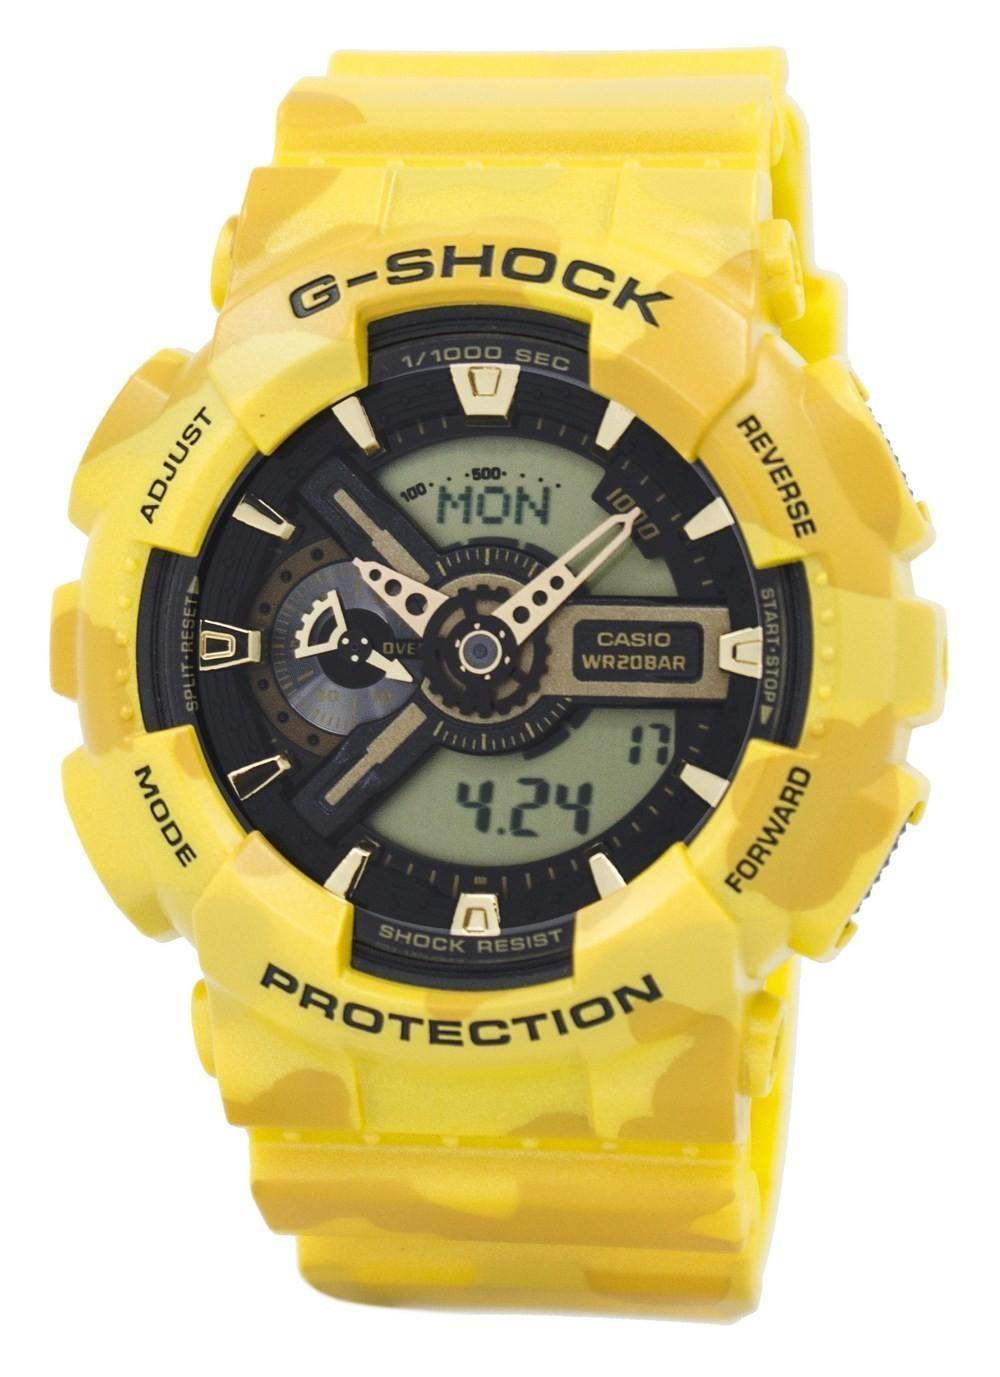 4b5ab57e9 Casio G-shock Camouflage Series Analog-digital Ga-110cm-9a Men's Watch